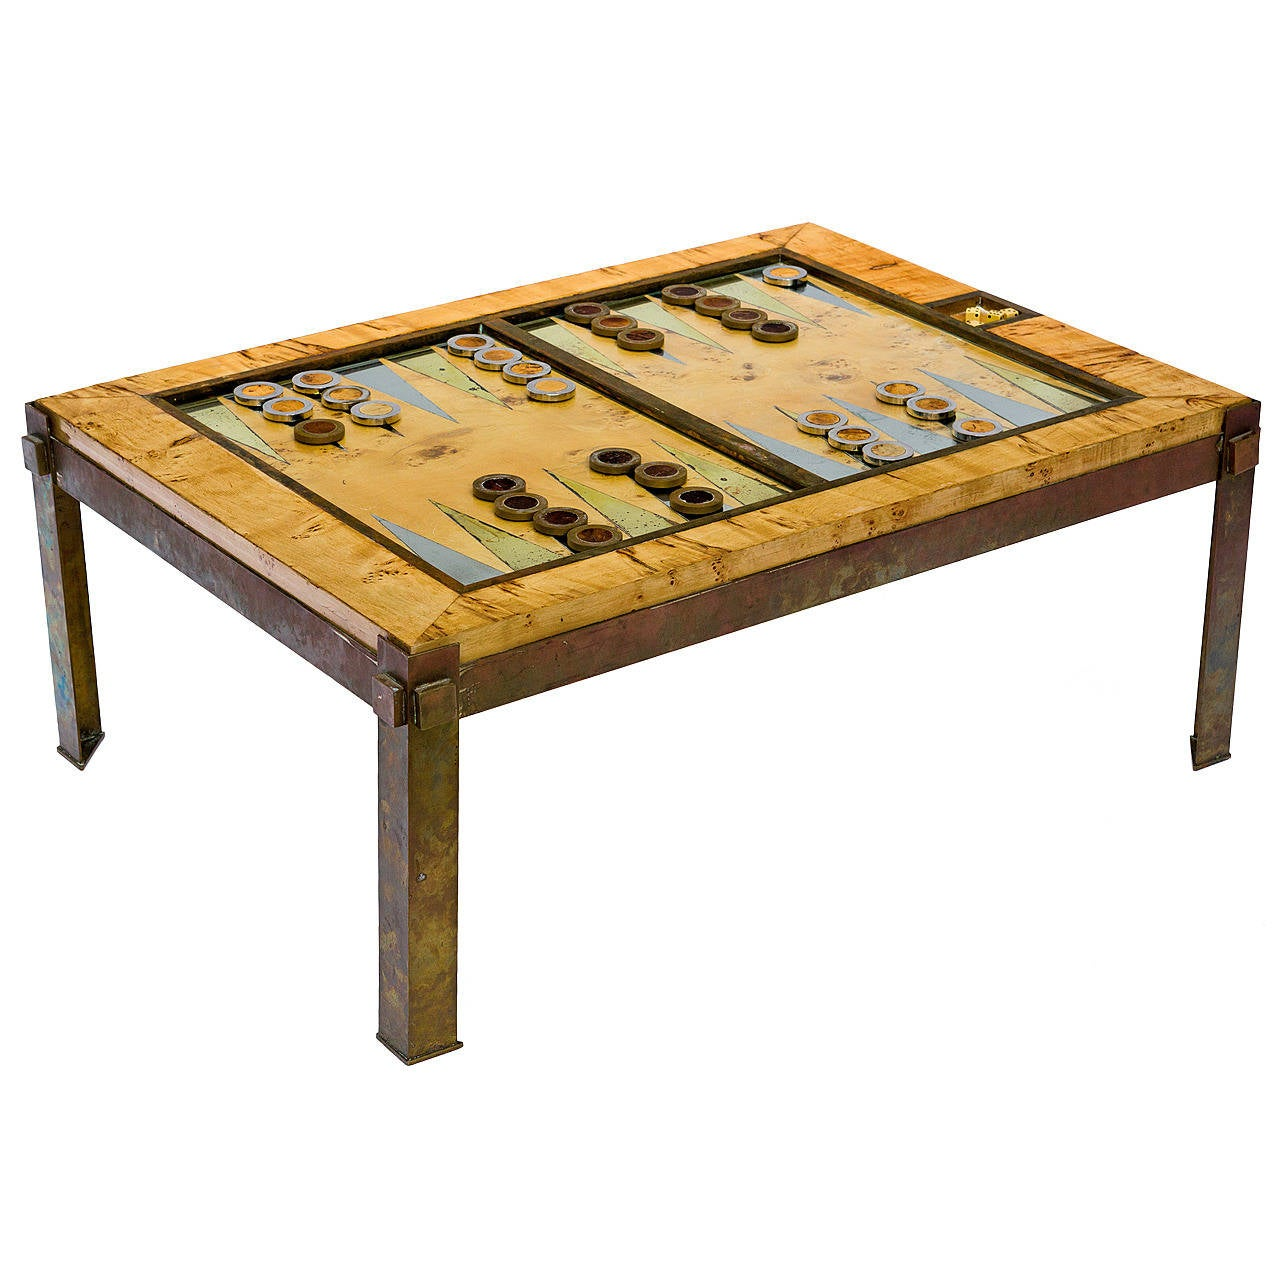 tommaso barbi backgammon table. Black Bedroom Furniture Sets. Home Design Ideas